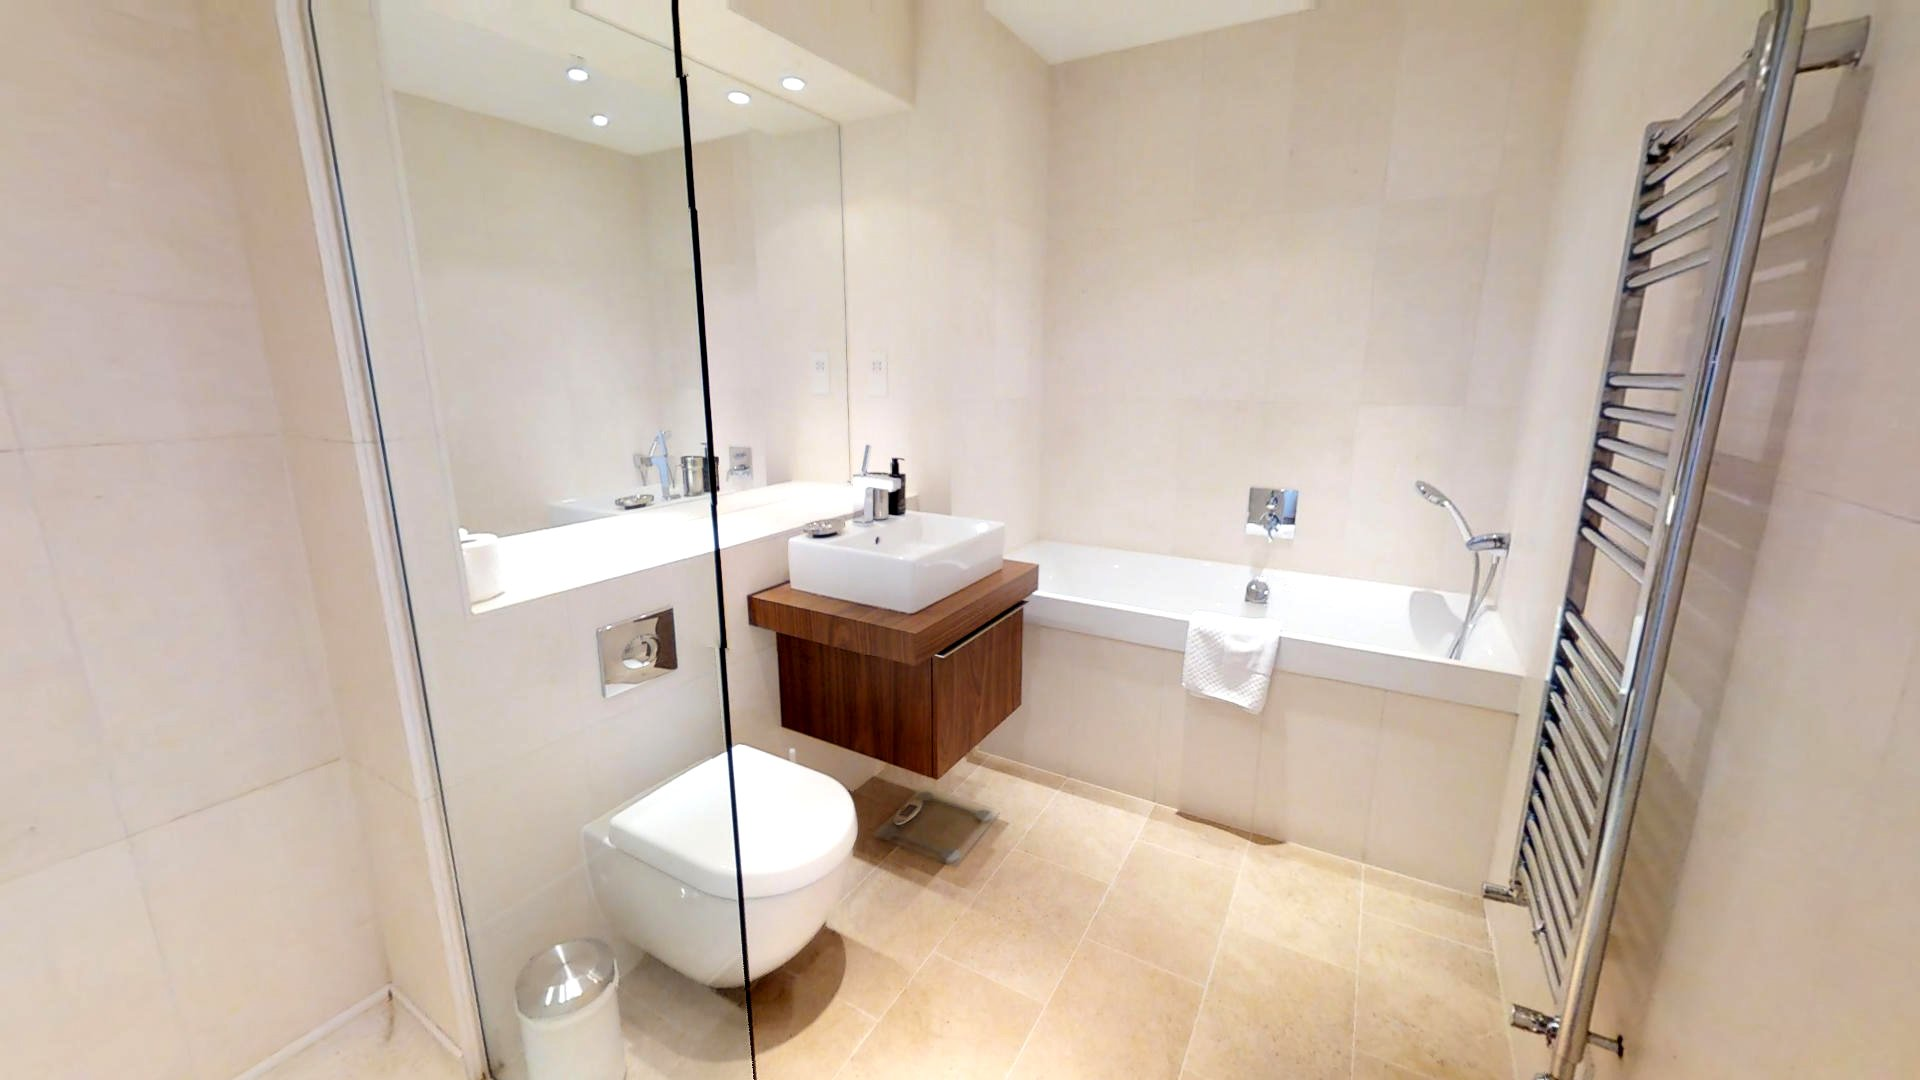 Accordia luxury bathroom